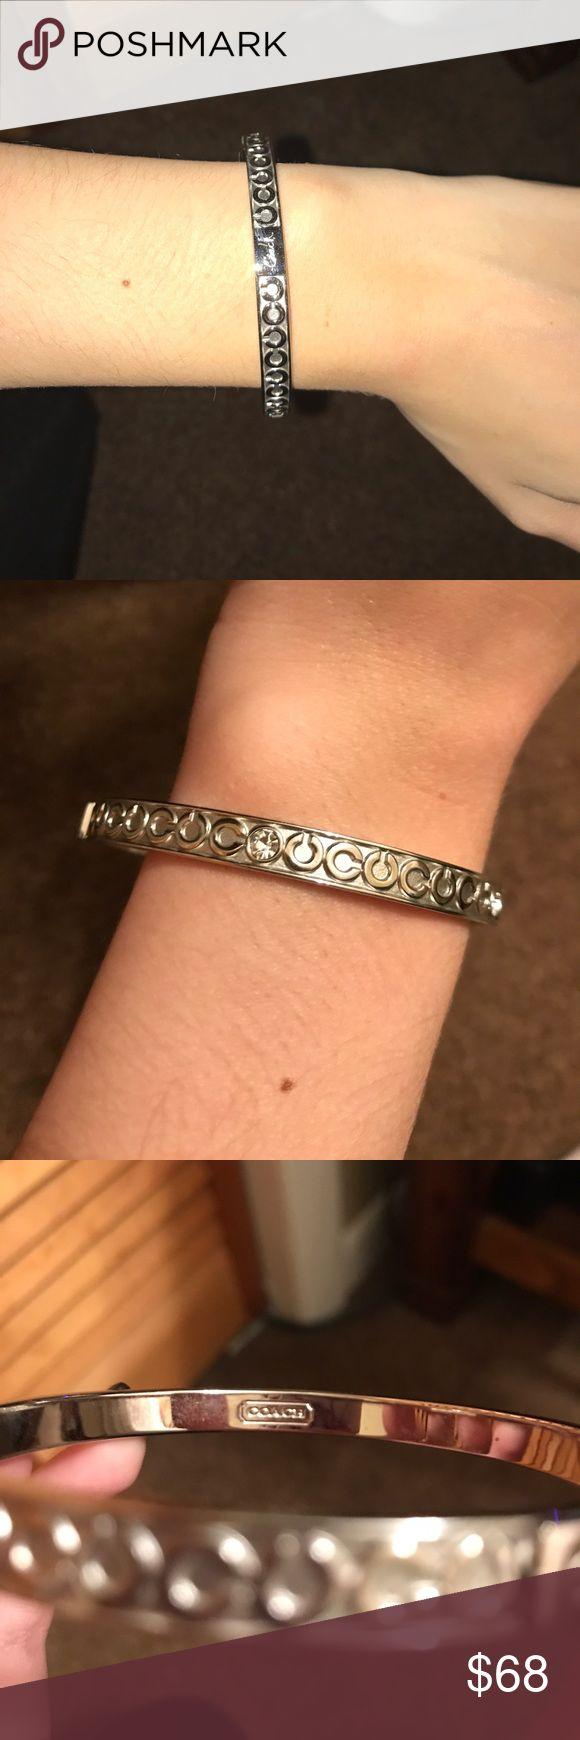 NWOT Coach Bracelet AUTHENTIC NWOT Coach Bracelet. Beautiful Silver Bracelet with Cs and 4 Rhinestones. Shop with confidence... I'm a Suggested User/ Poshmark Ambassador. Make me an offer  Coach Jewelry Bracelets